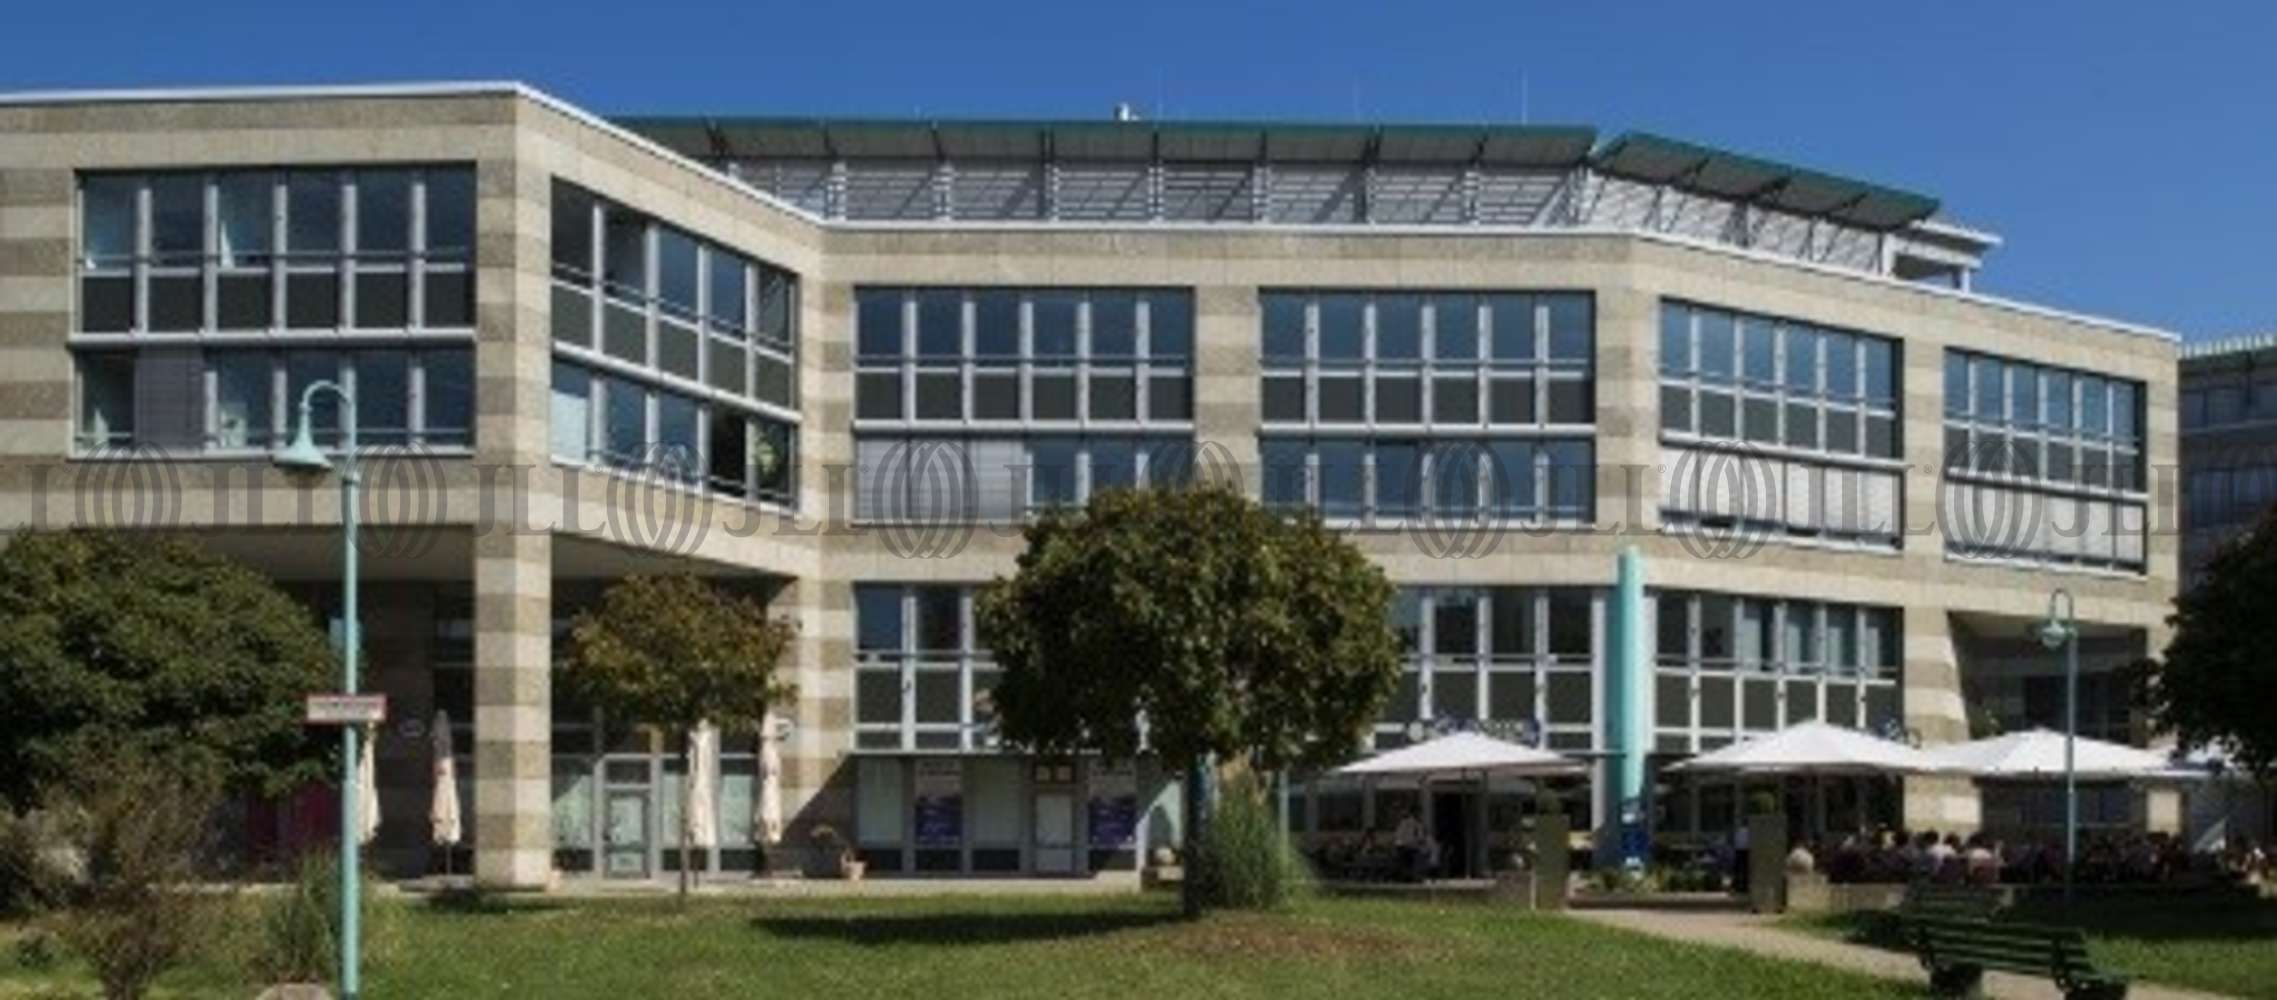 Büros Rüsselsheim, 65428 - Büro - Rüsselsheim - F0021 - 9415399